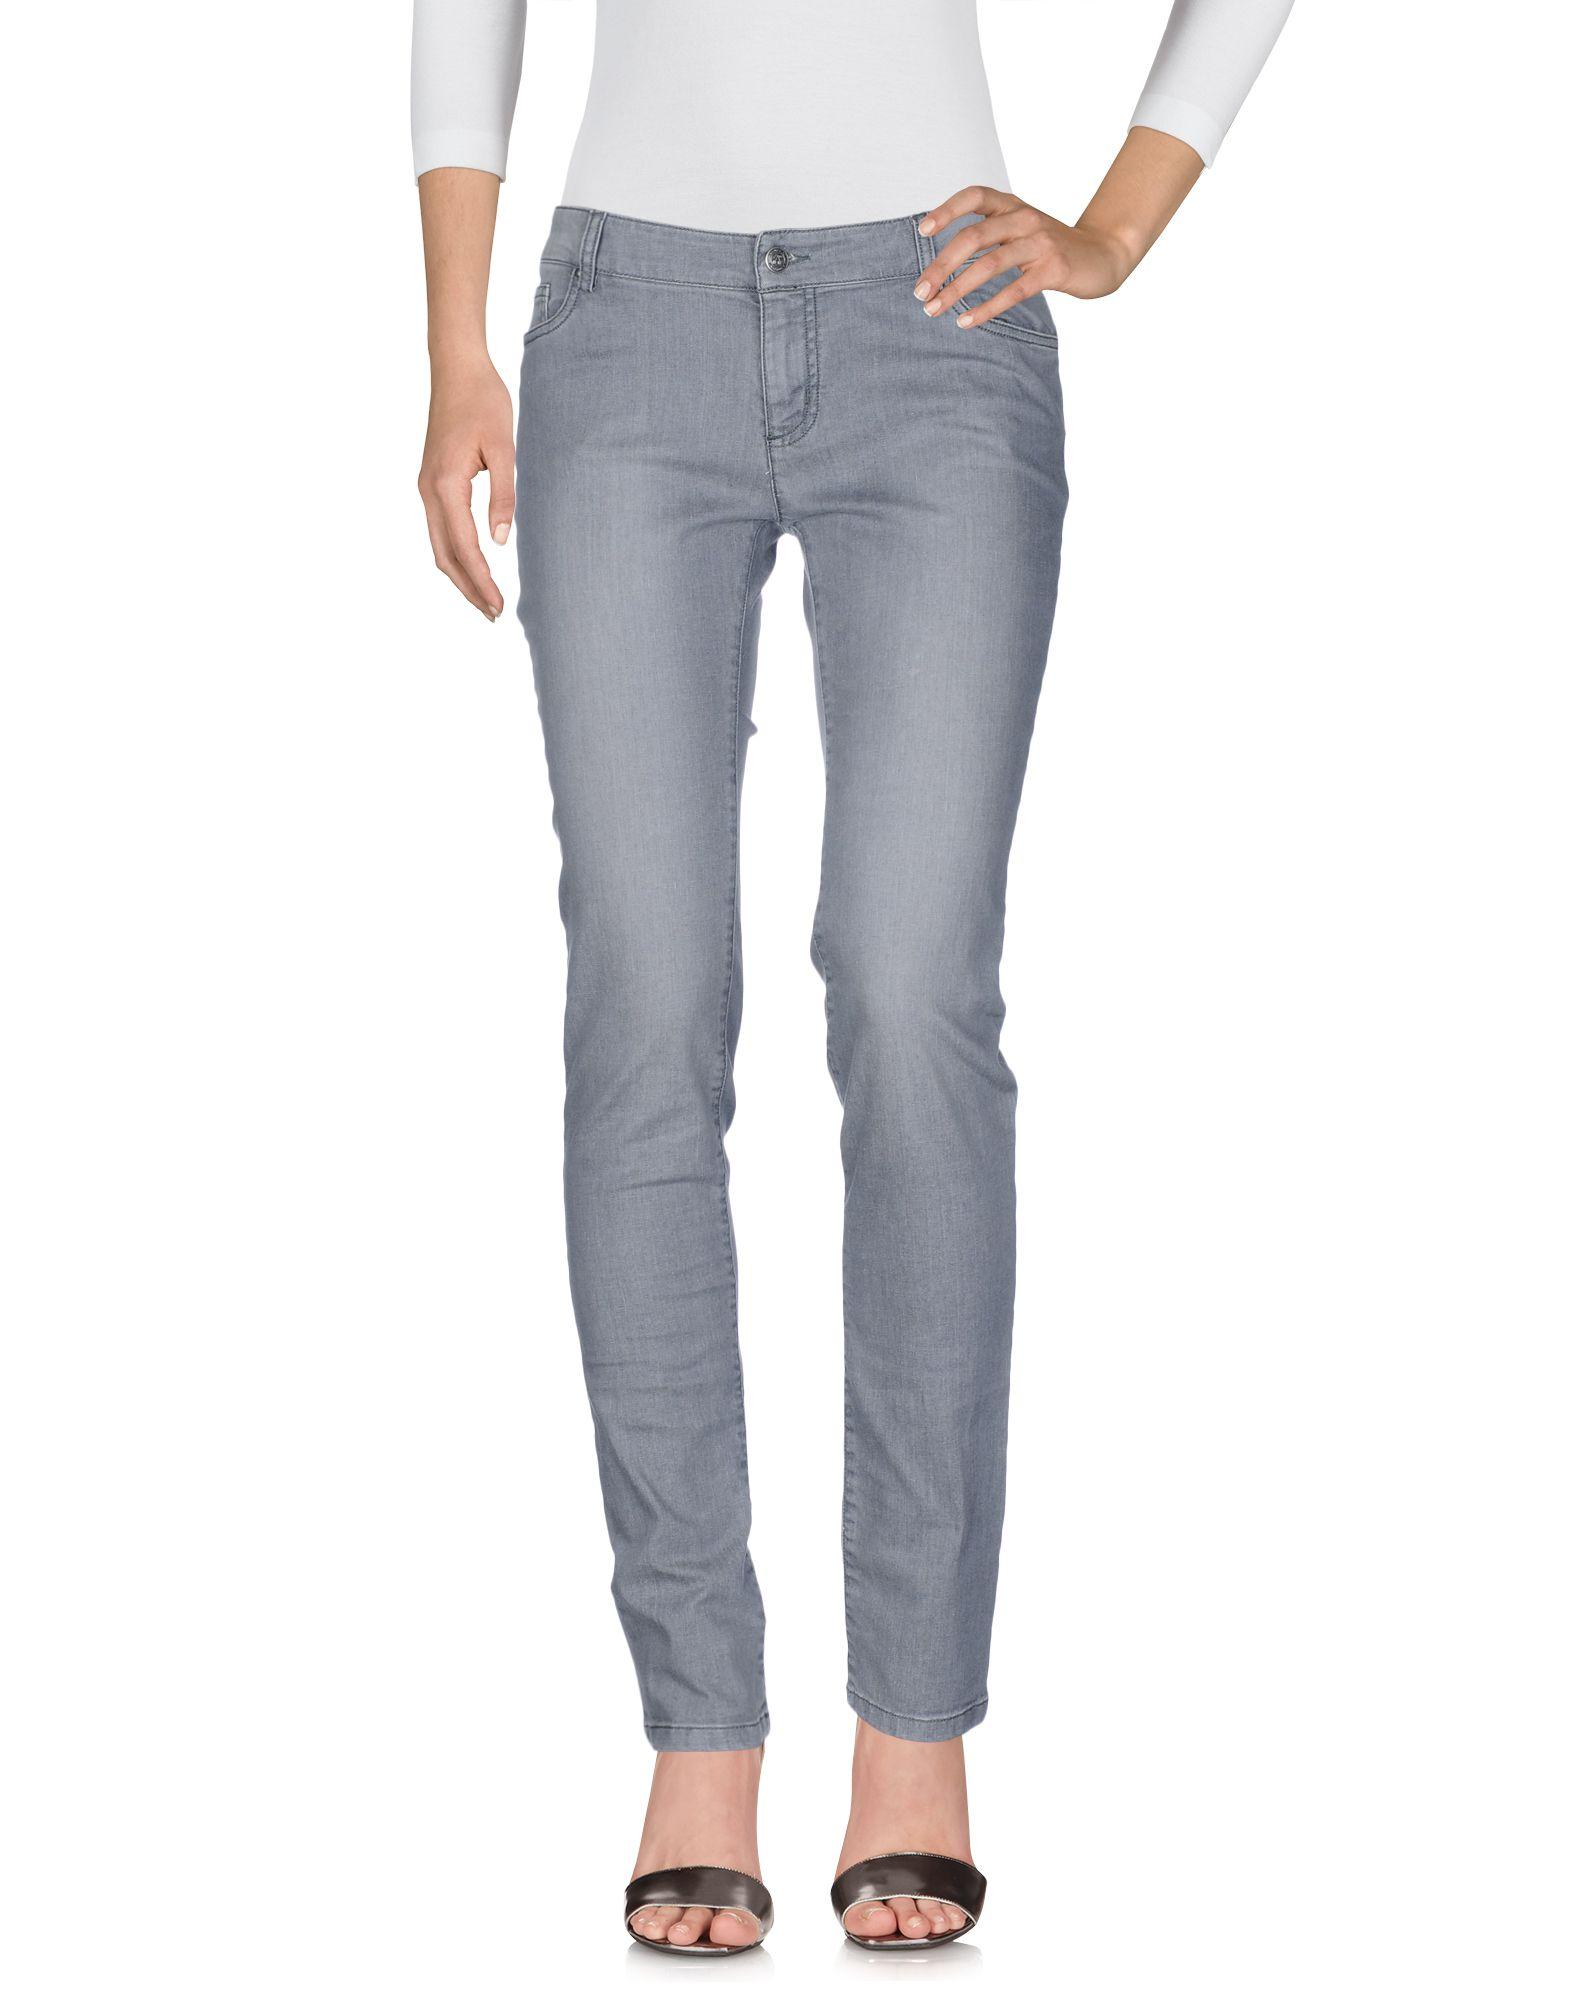 BONPOINT Denim Pants in Grey